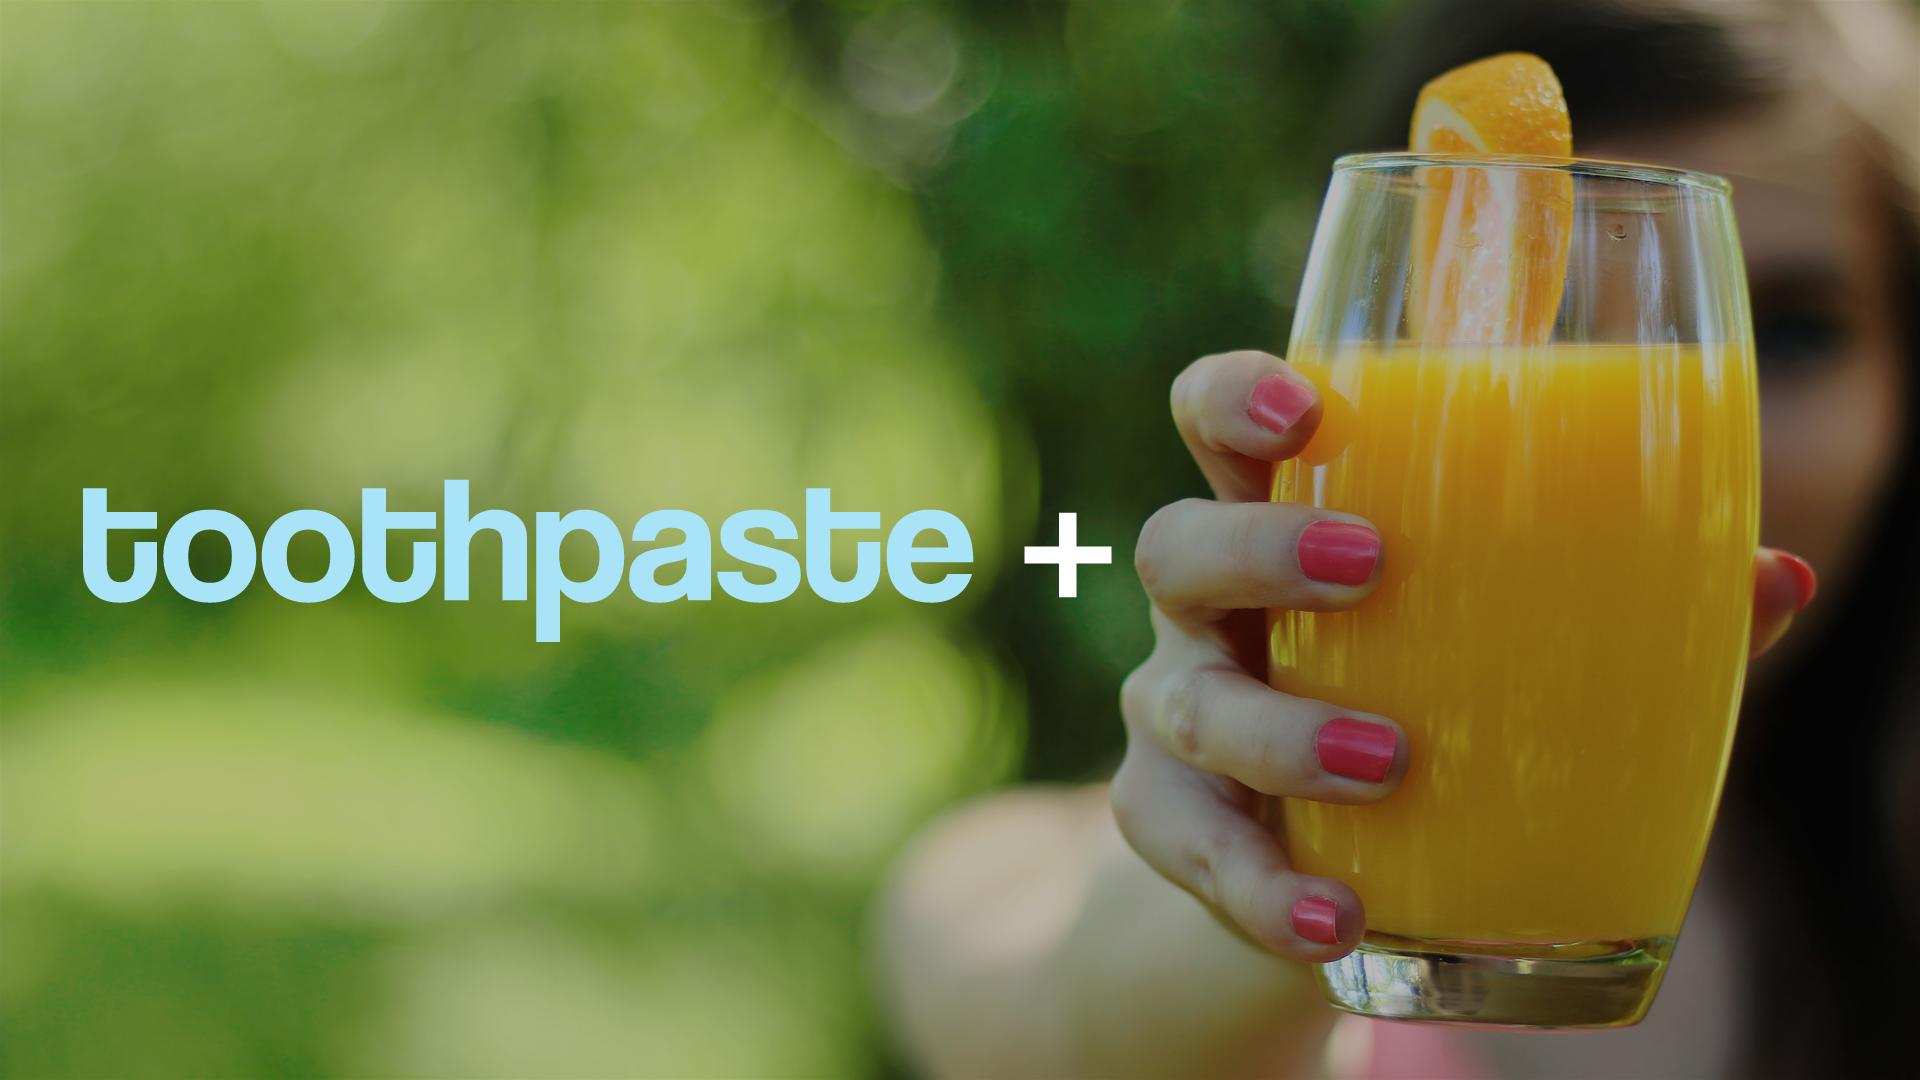 toothpaste and orange juice